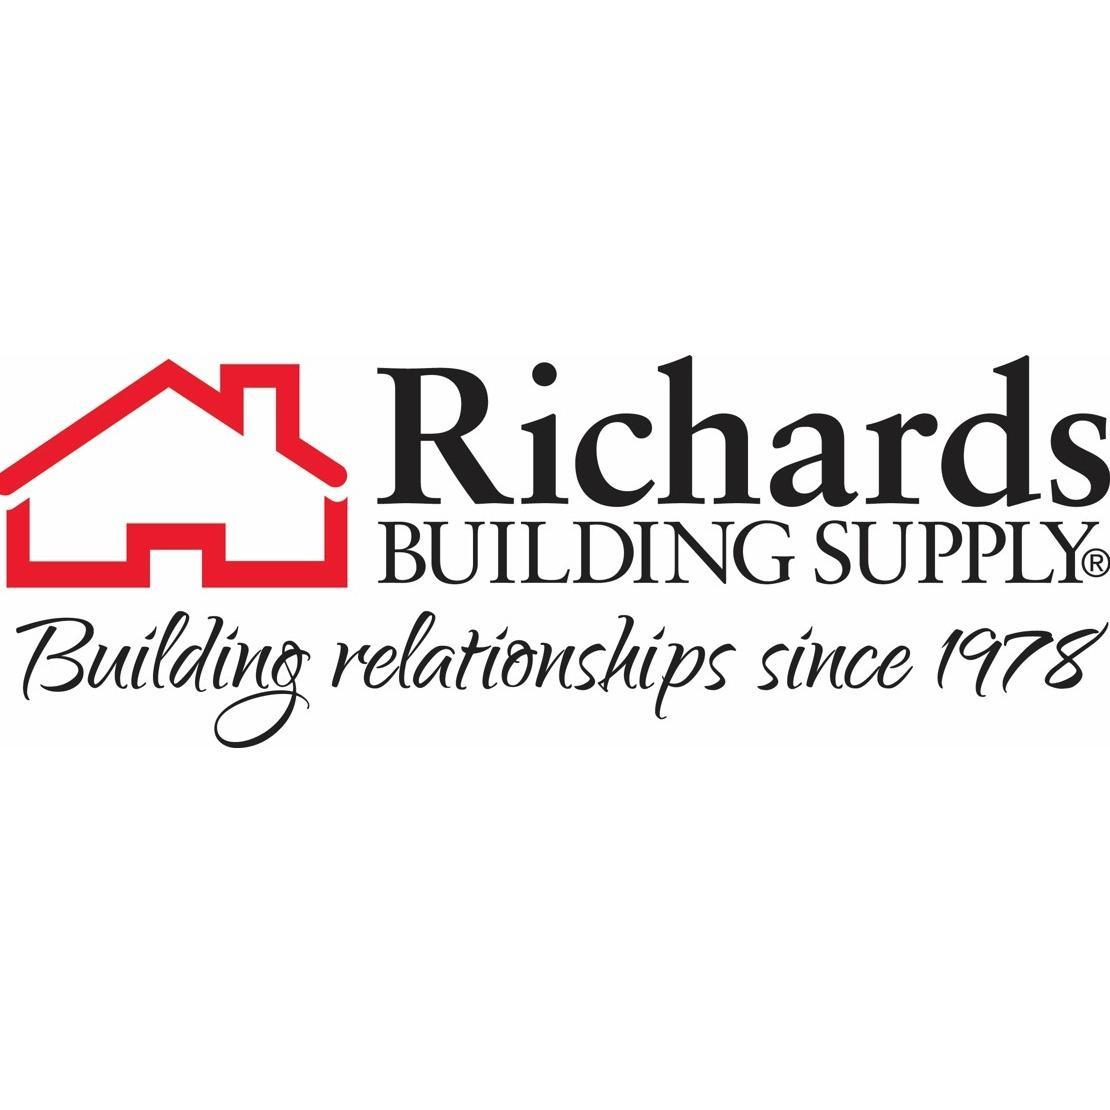 Richards Building Supply - Champaign, IL 61822 - (217)359-7663 | ShowMeLocal.com